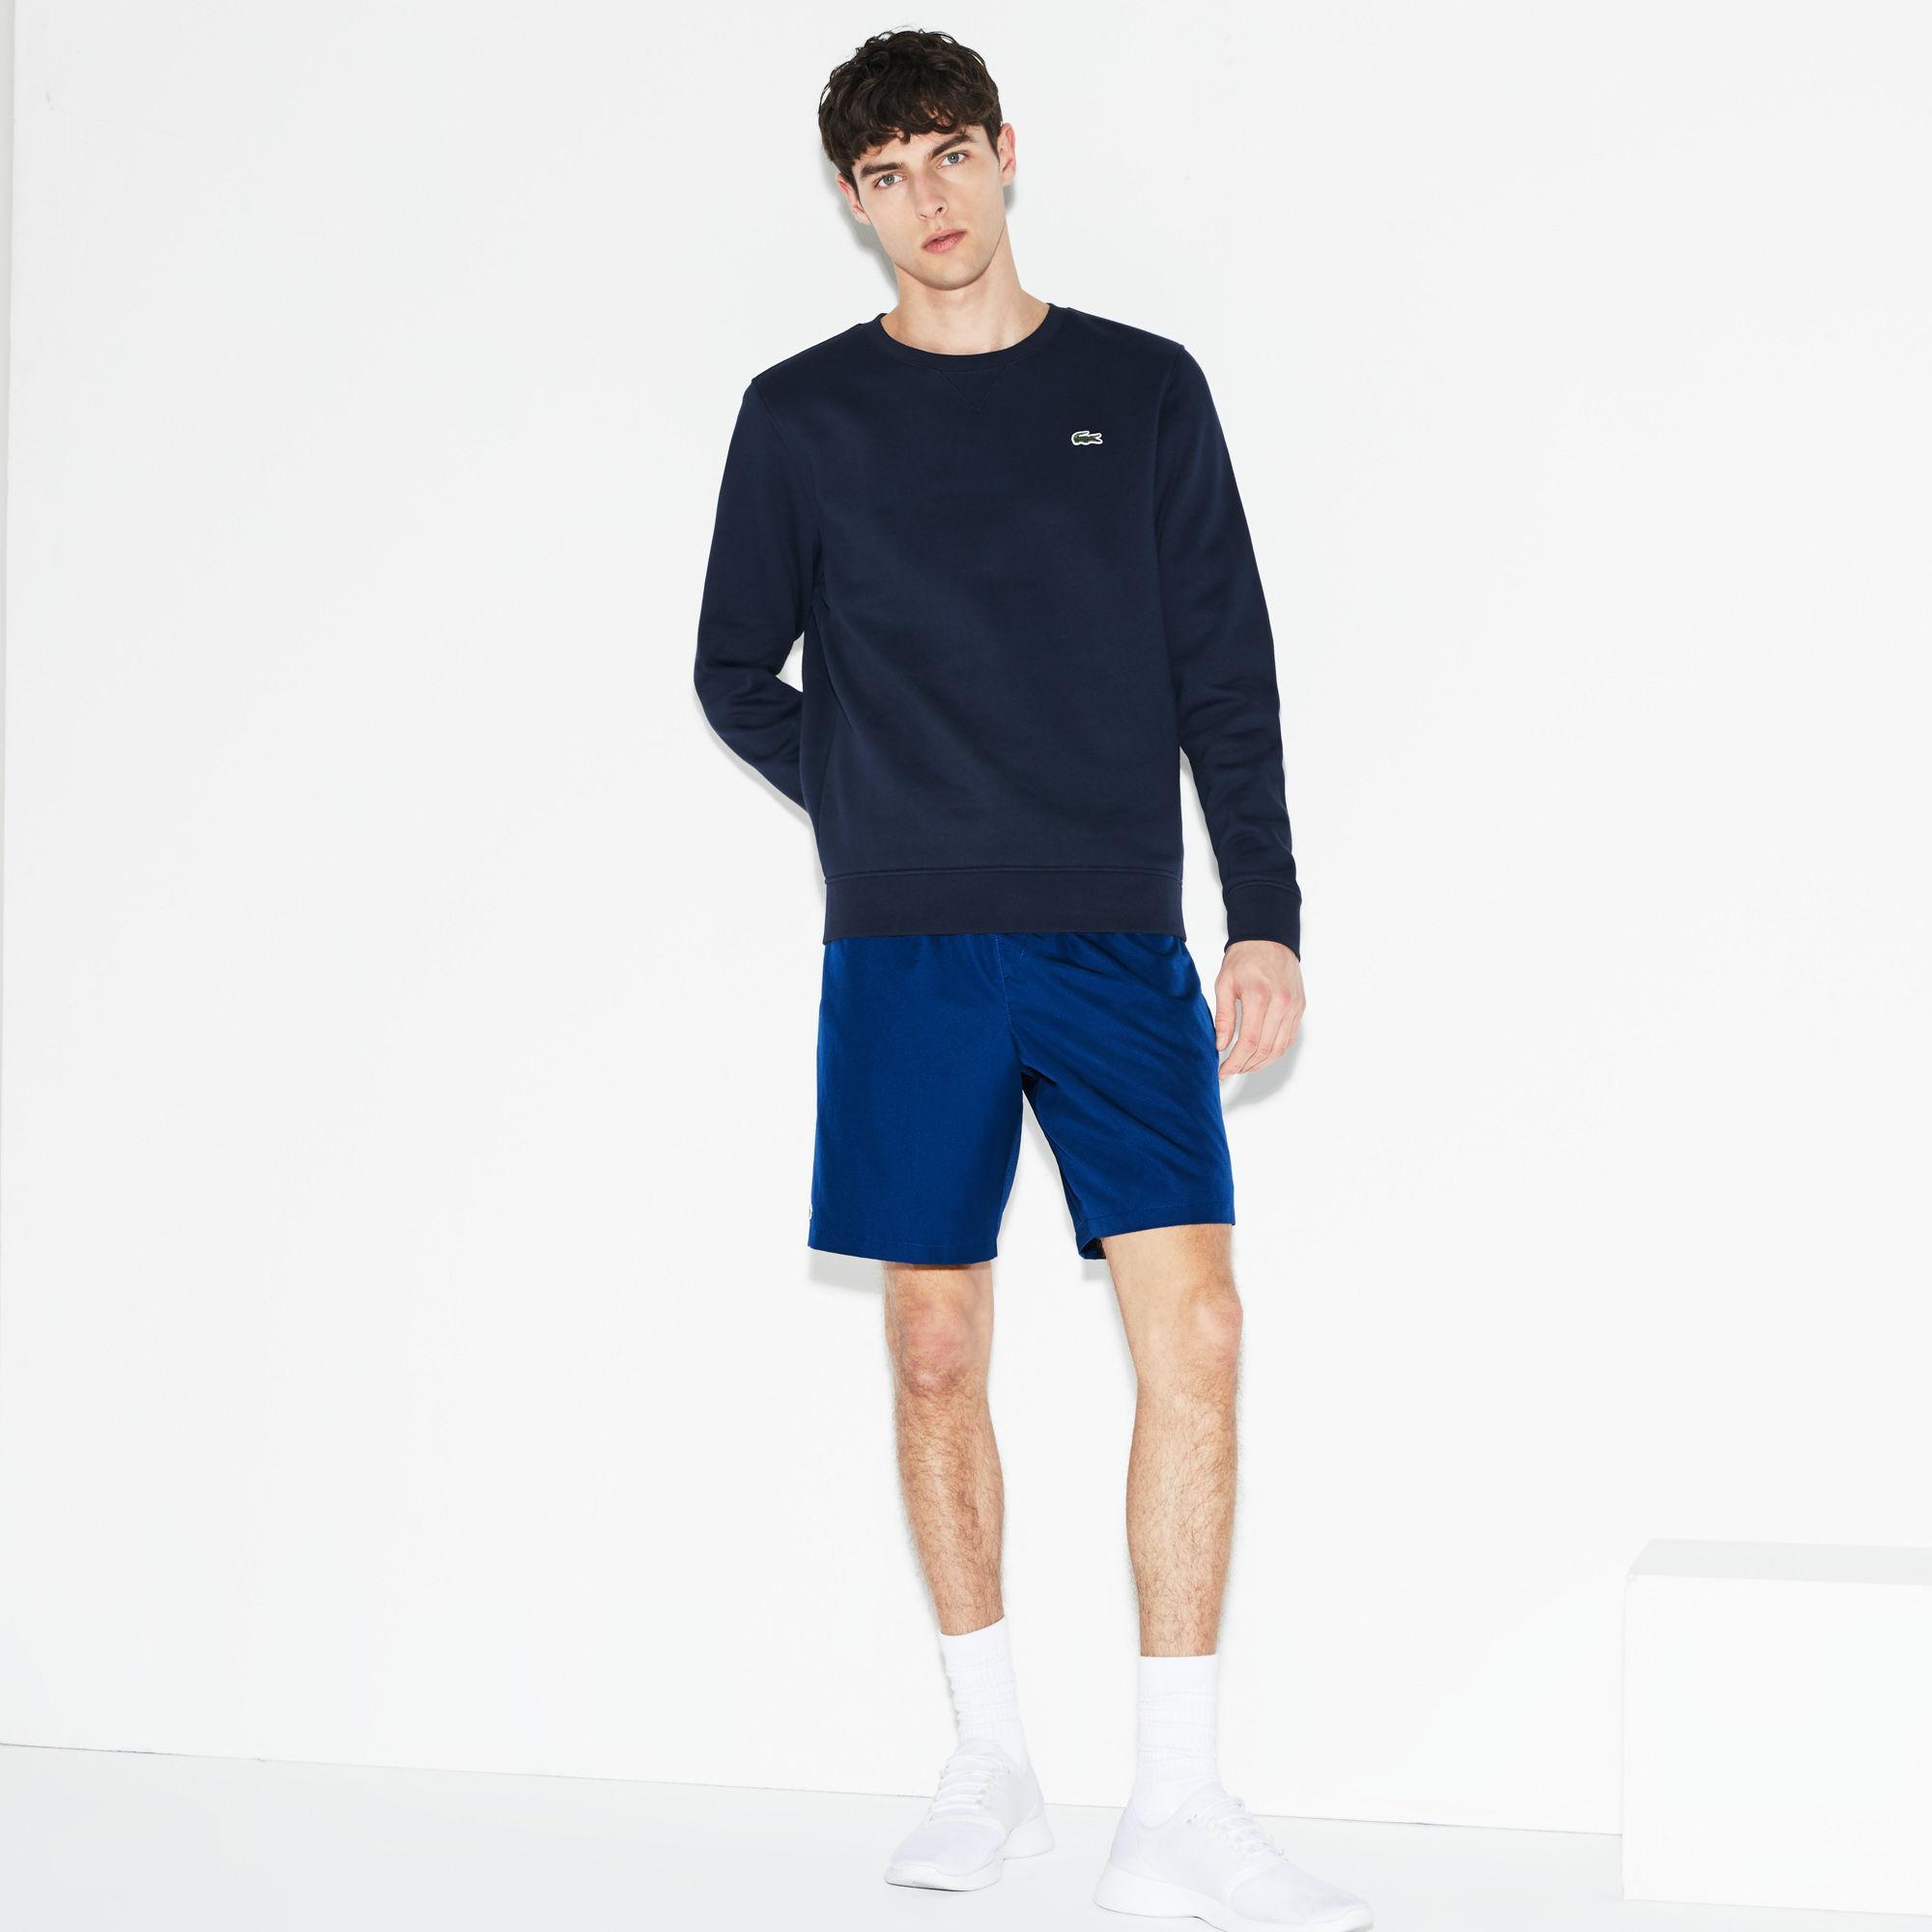 f540f3769b866 Lyst - Lacoste Sport Tennis Shorts in Blue for Men